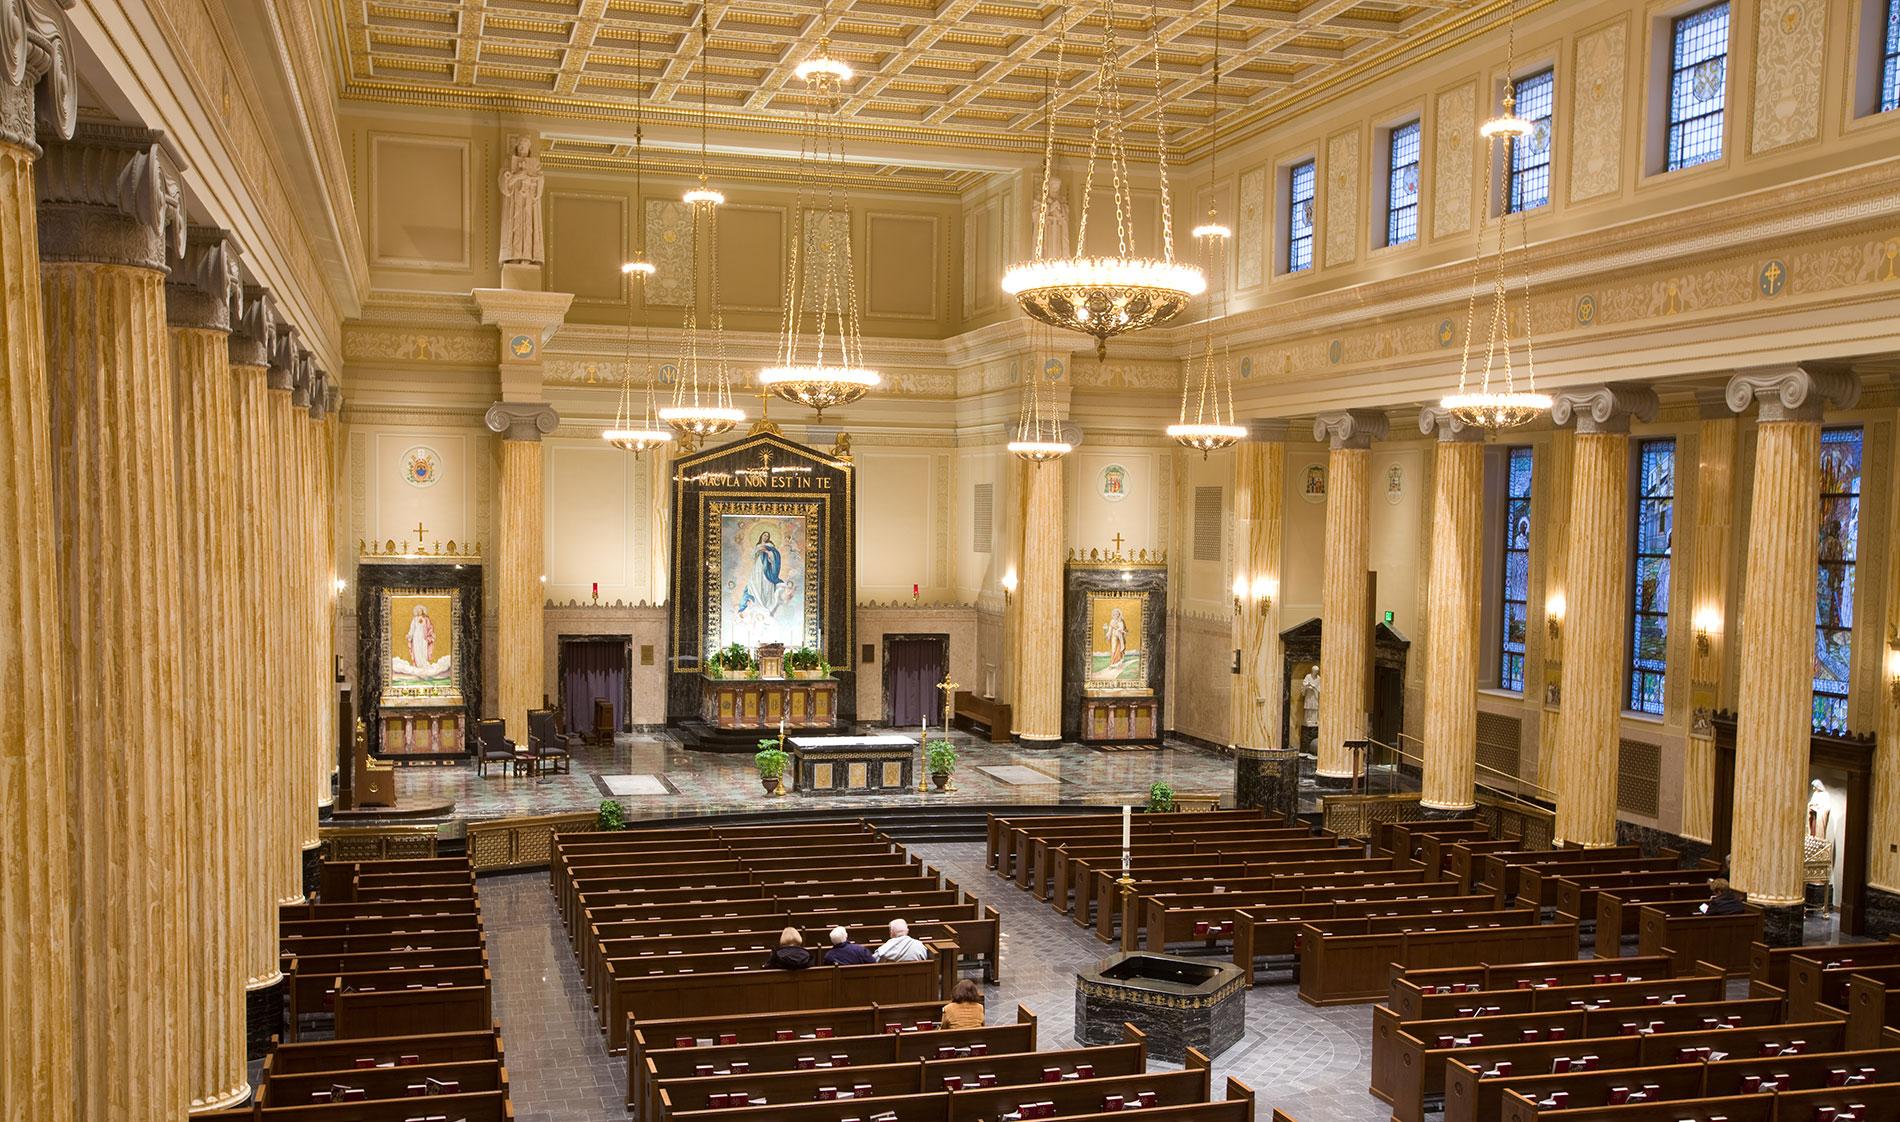 Church Ceiling Lighting Fixtures Led Church Lighting